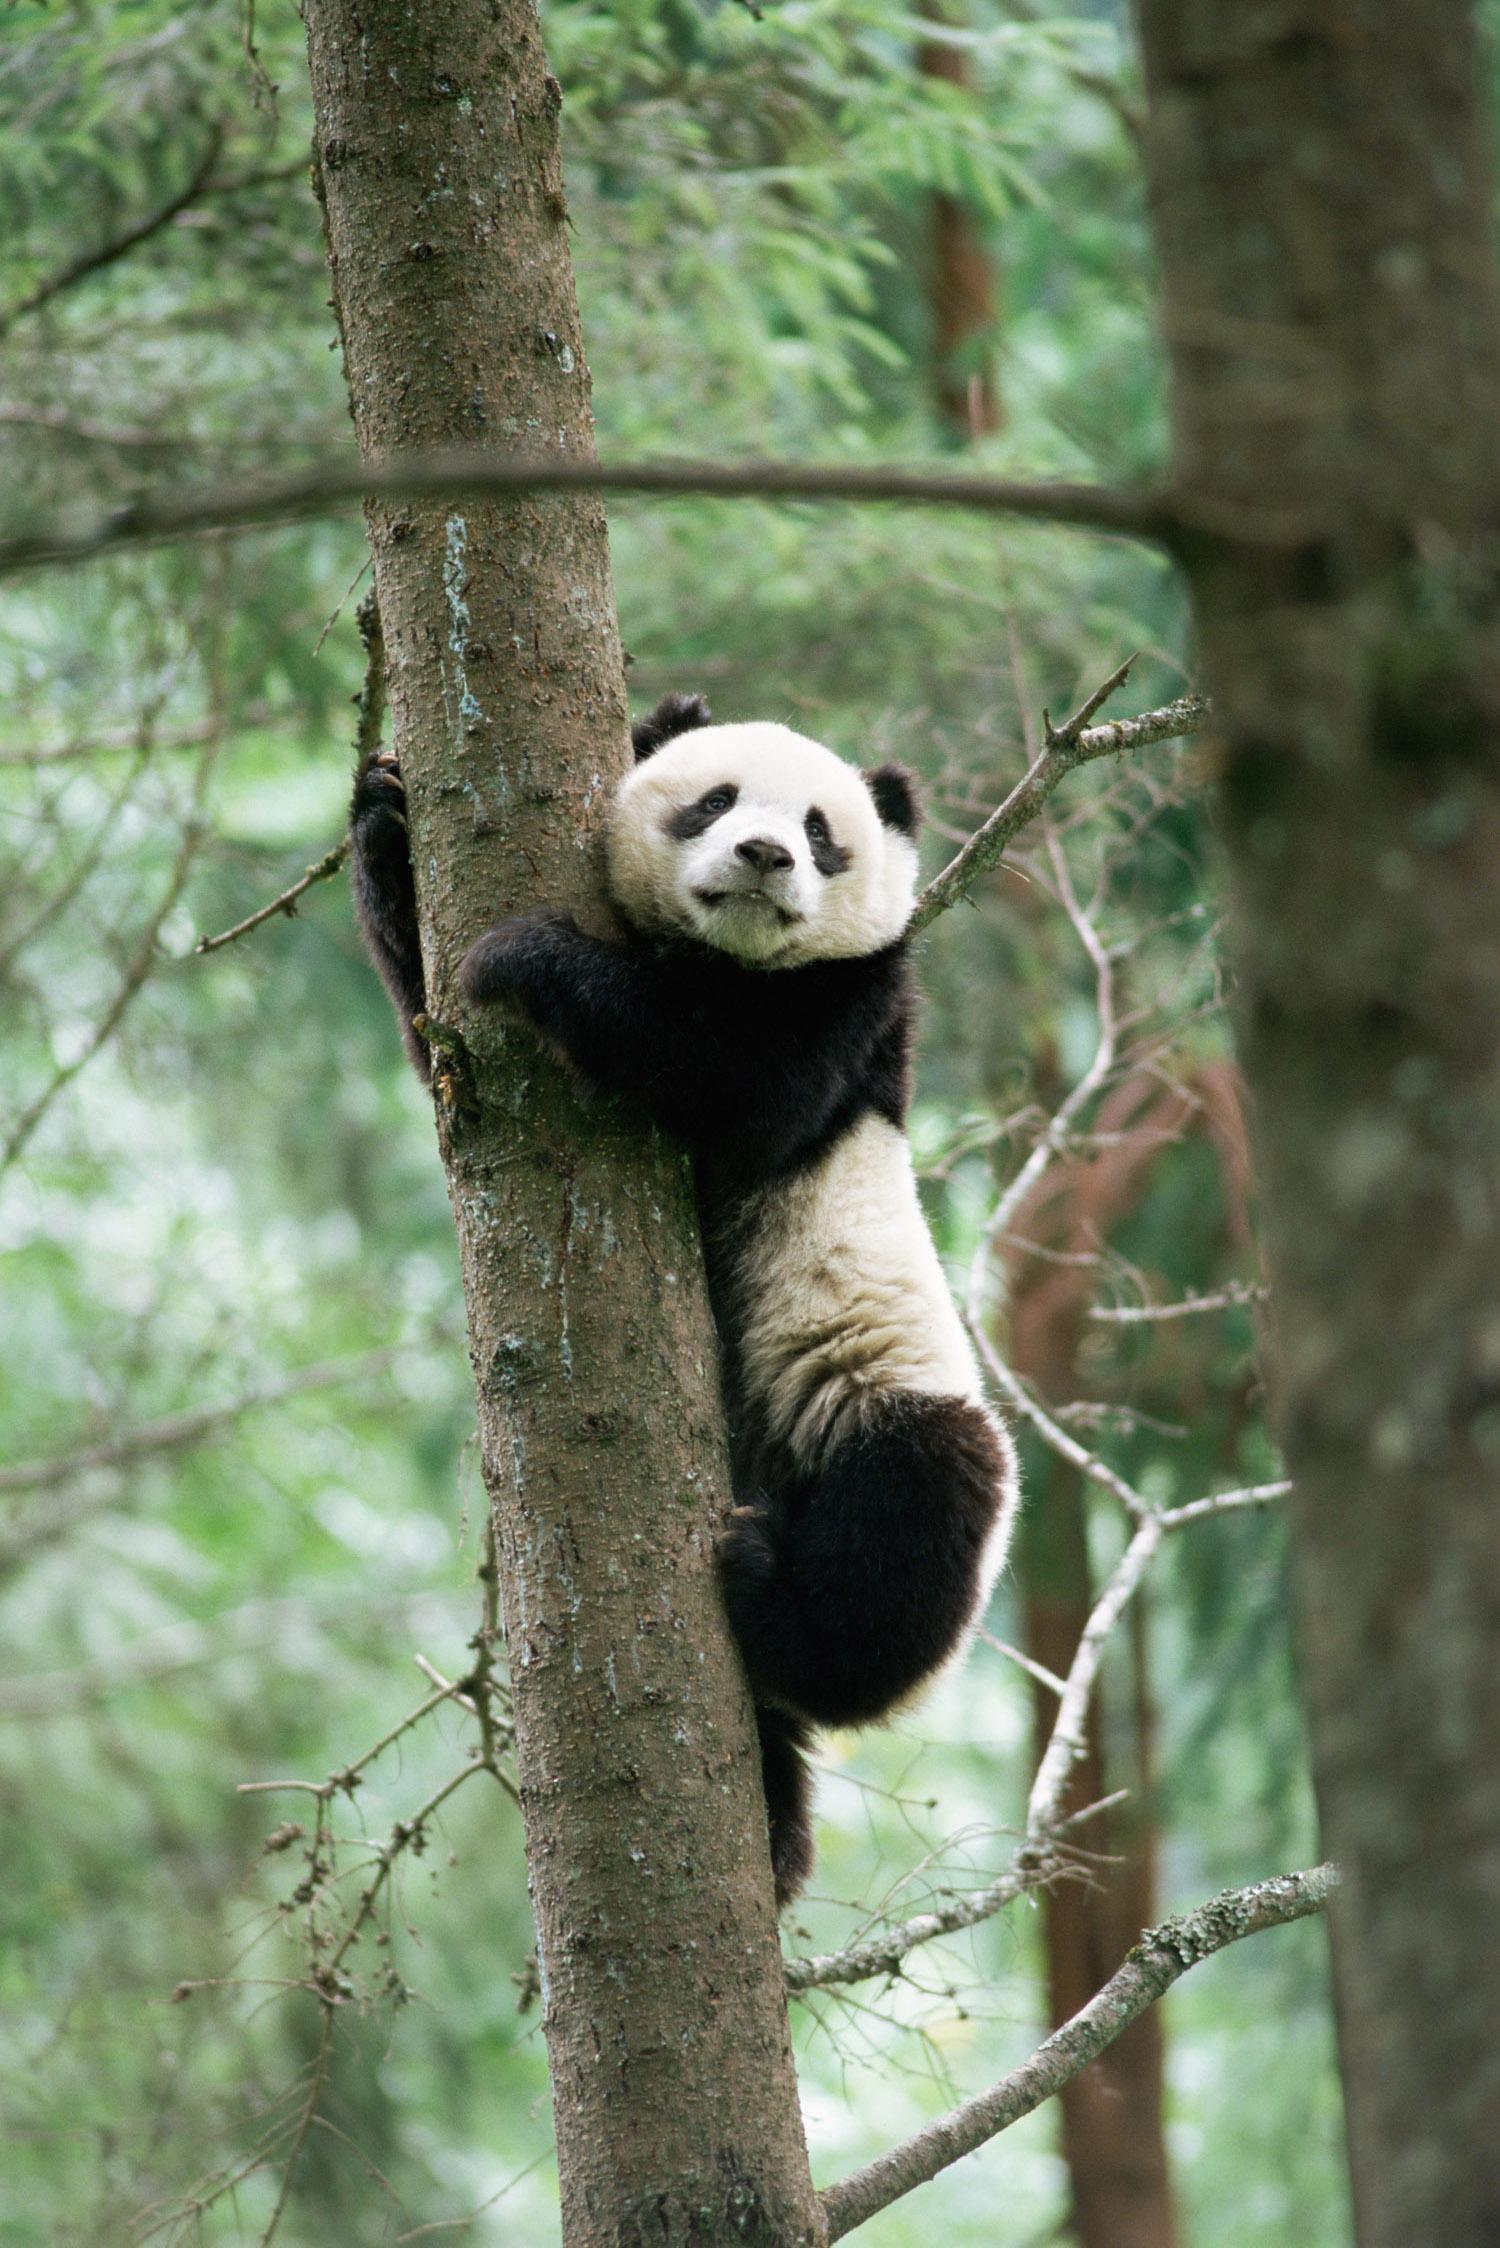 Giant panda cub (captive) climbing pine tree, Wolong National Nature Reserve, Sichuan, China